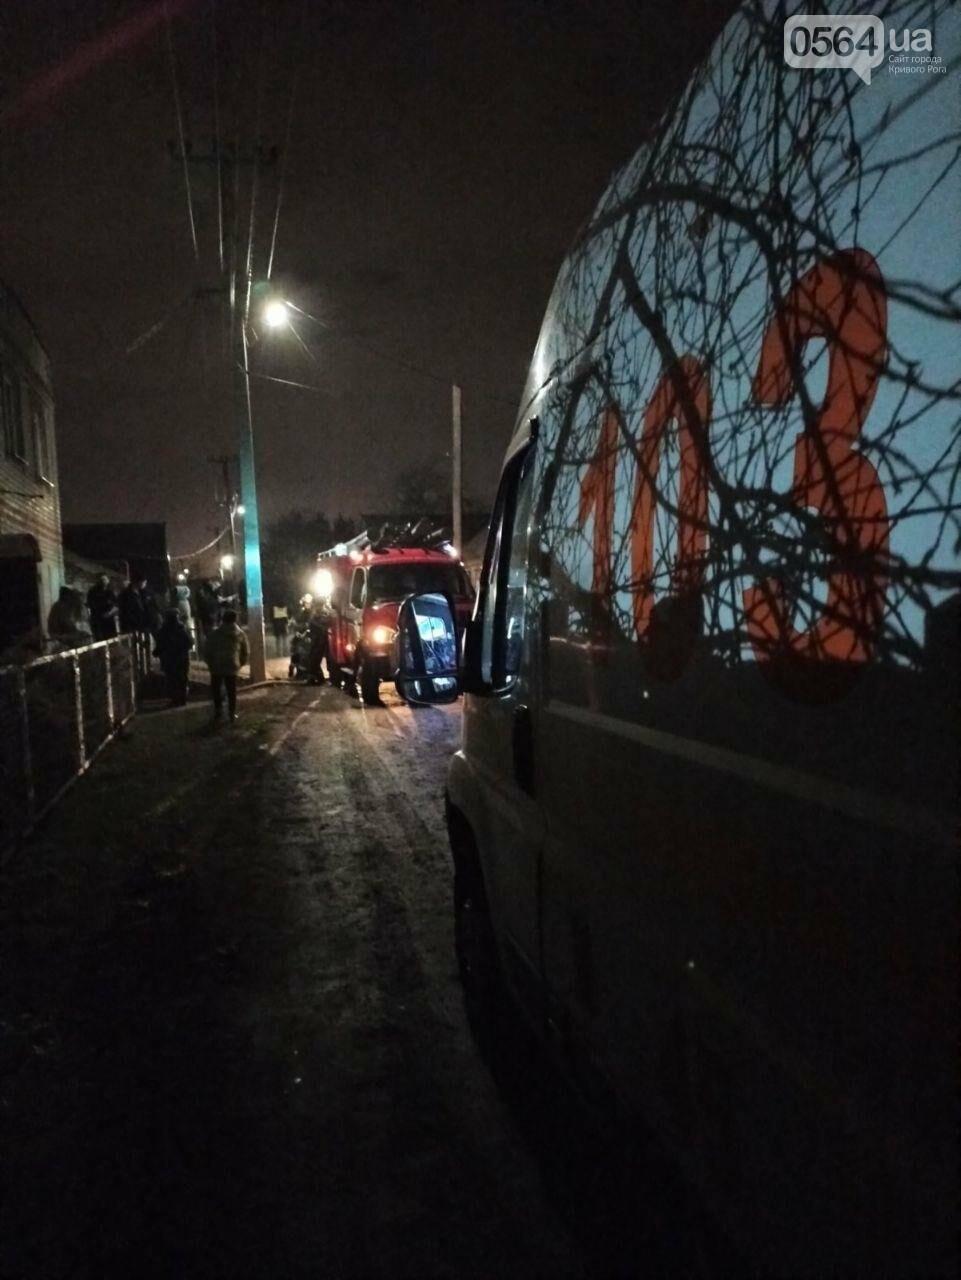 Во время пожара в Кривом Роге пострадал 70-летний пенсионер, - ФОТО , фото-5